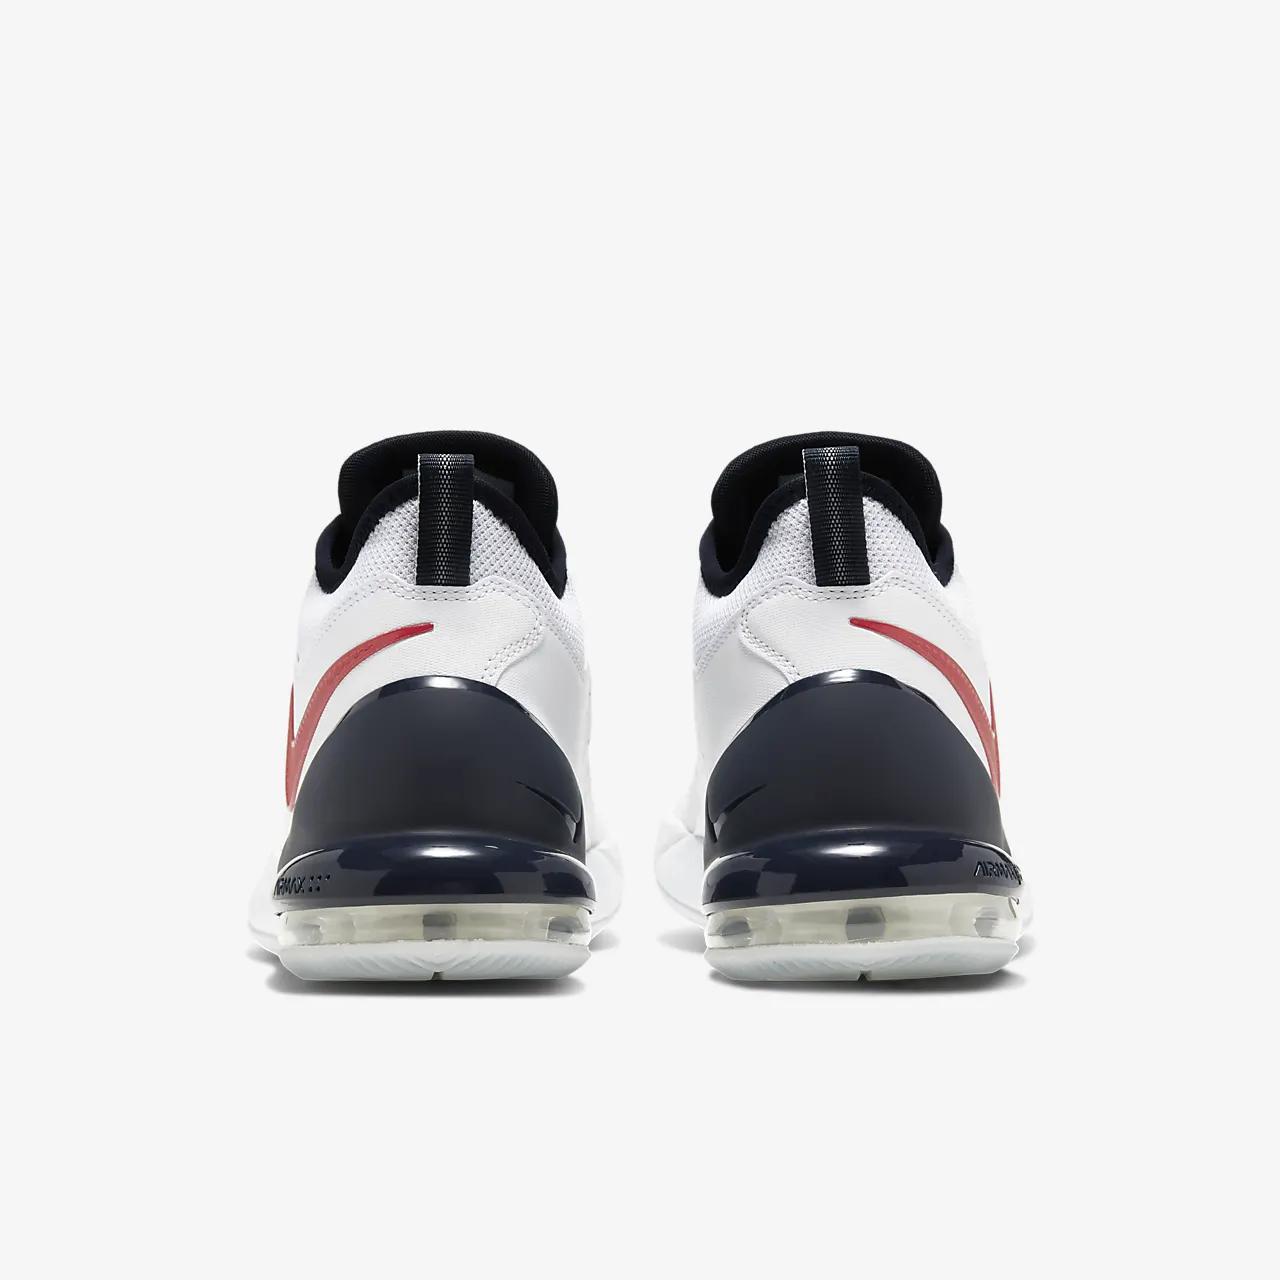 Nike Air Max Impact Basketball Shoe CW5881-100